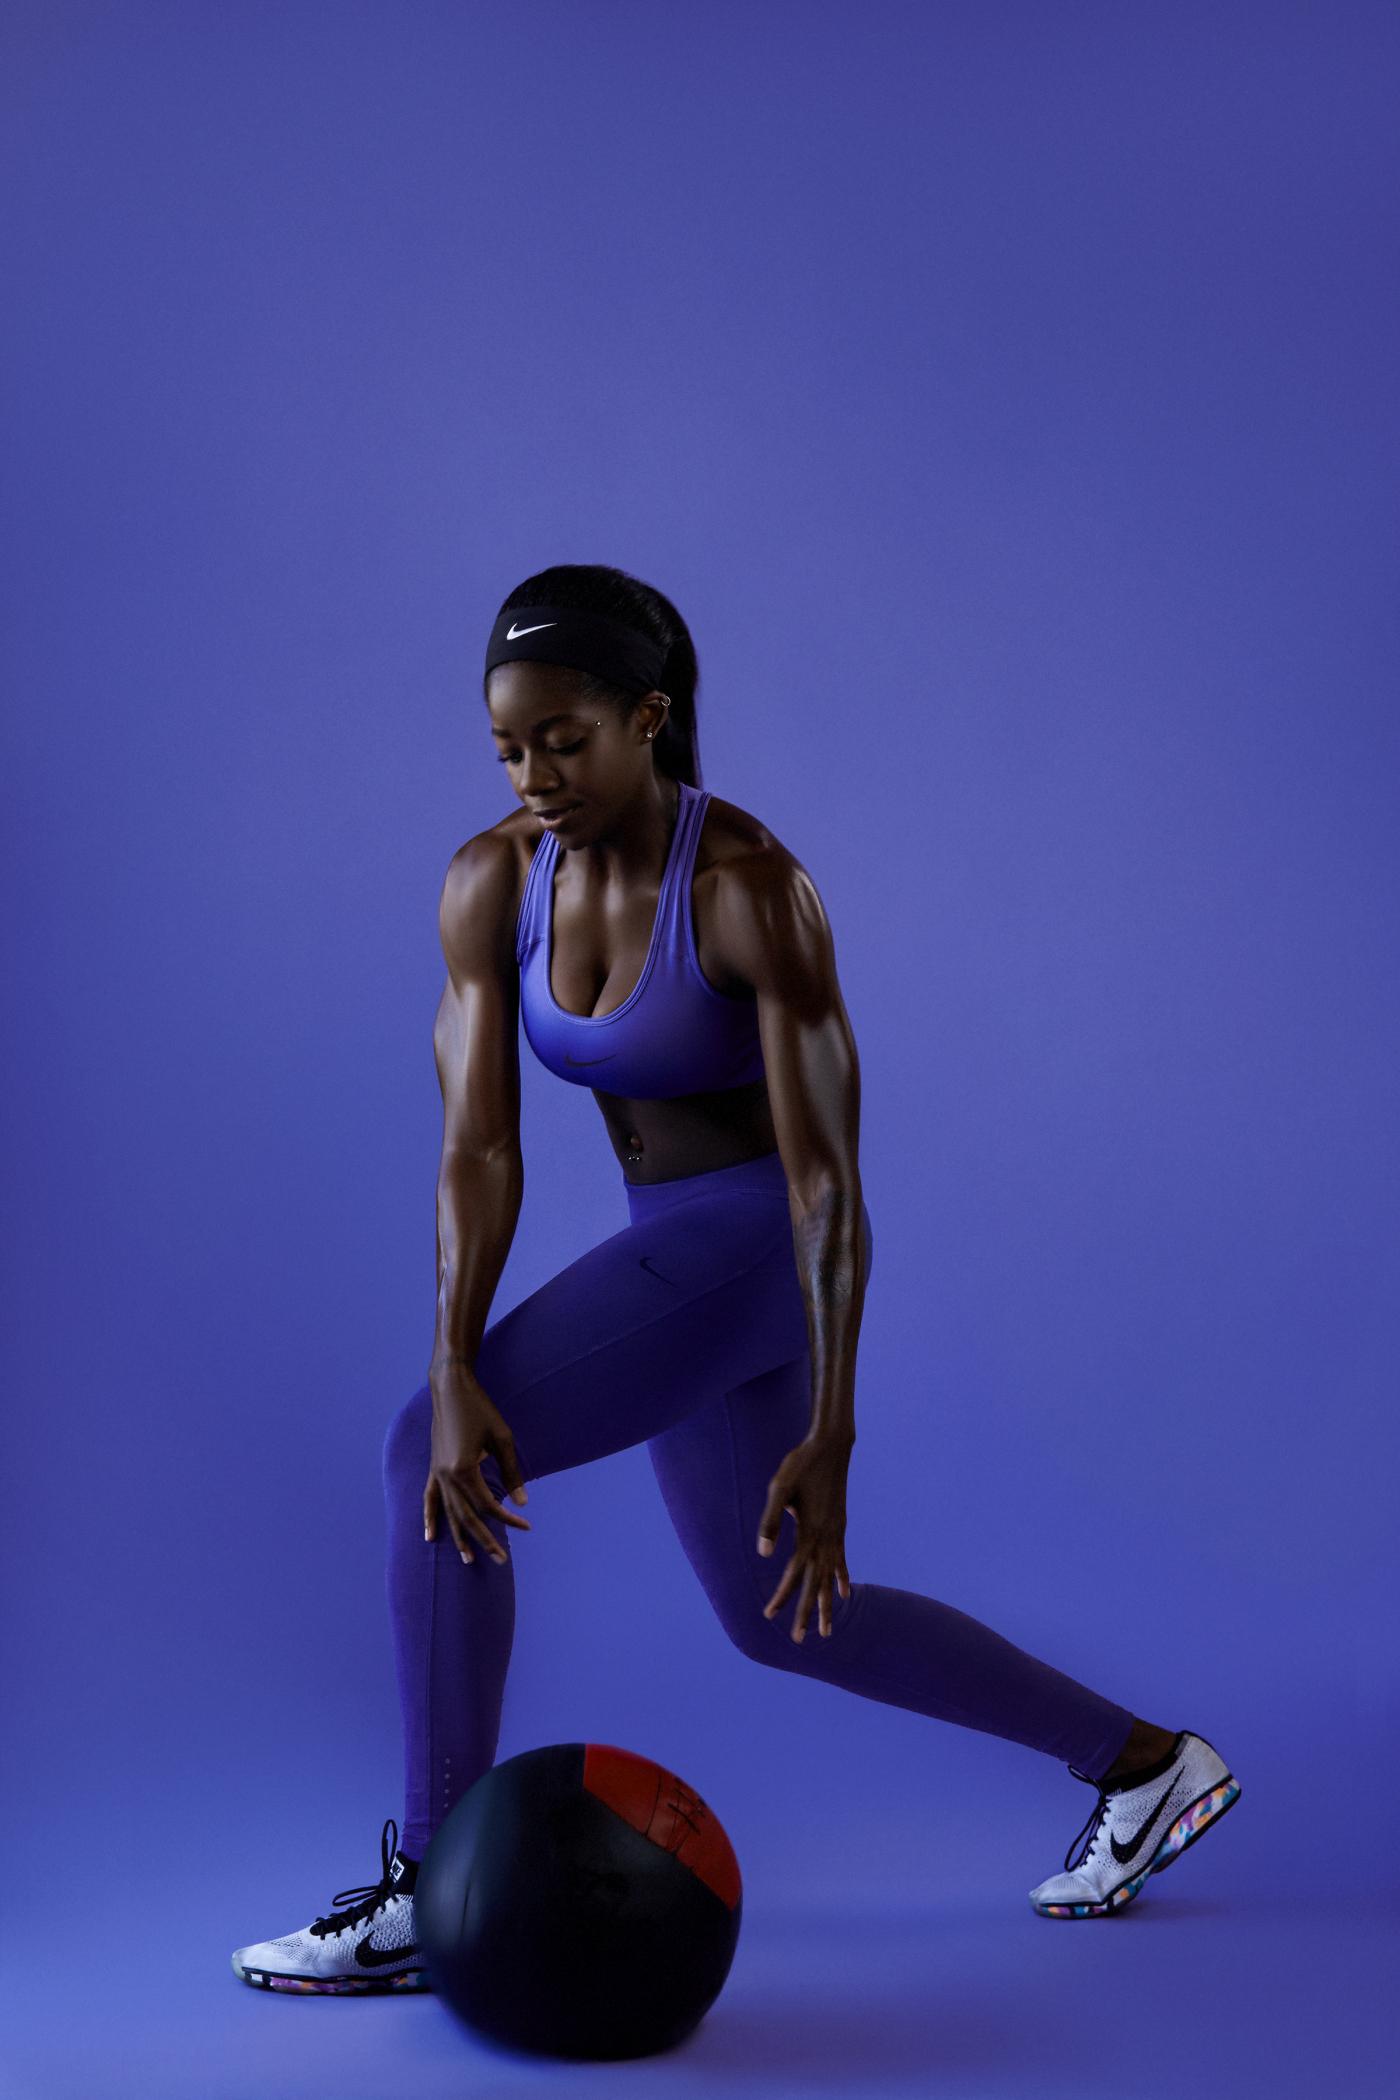 Fitness-20-Tara1.jpg